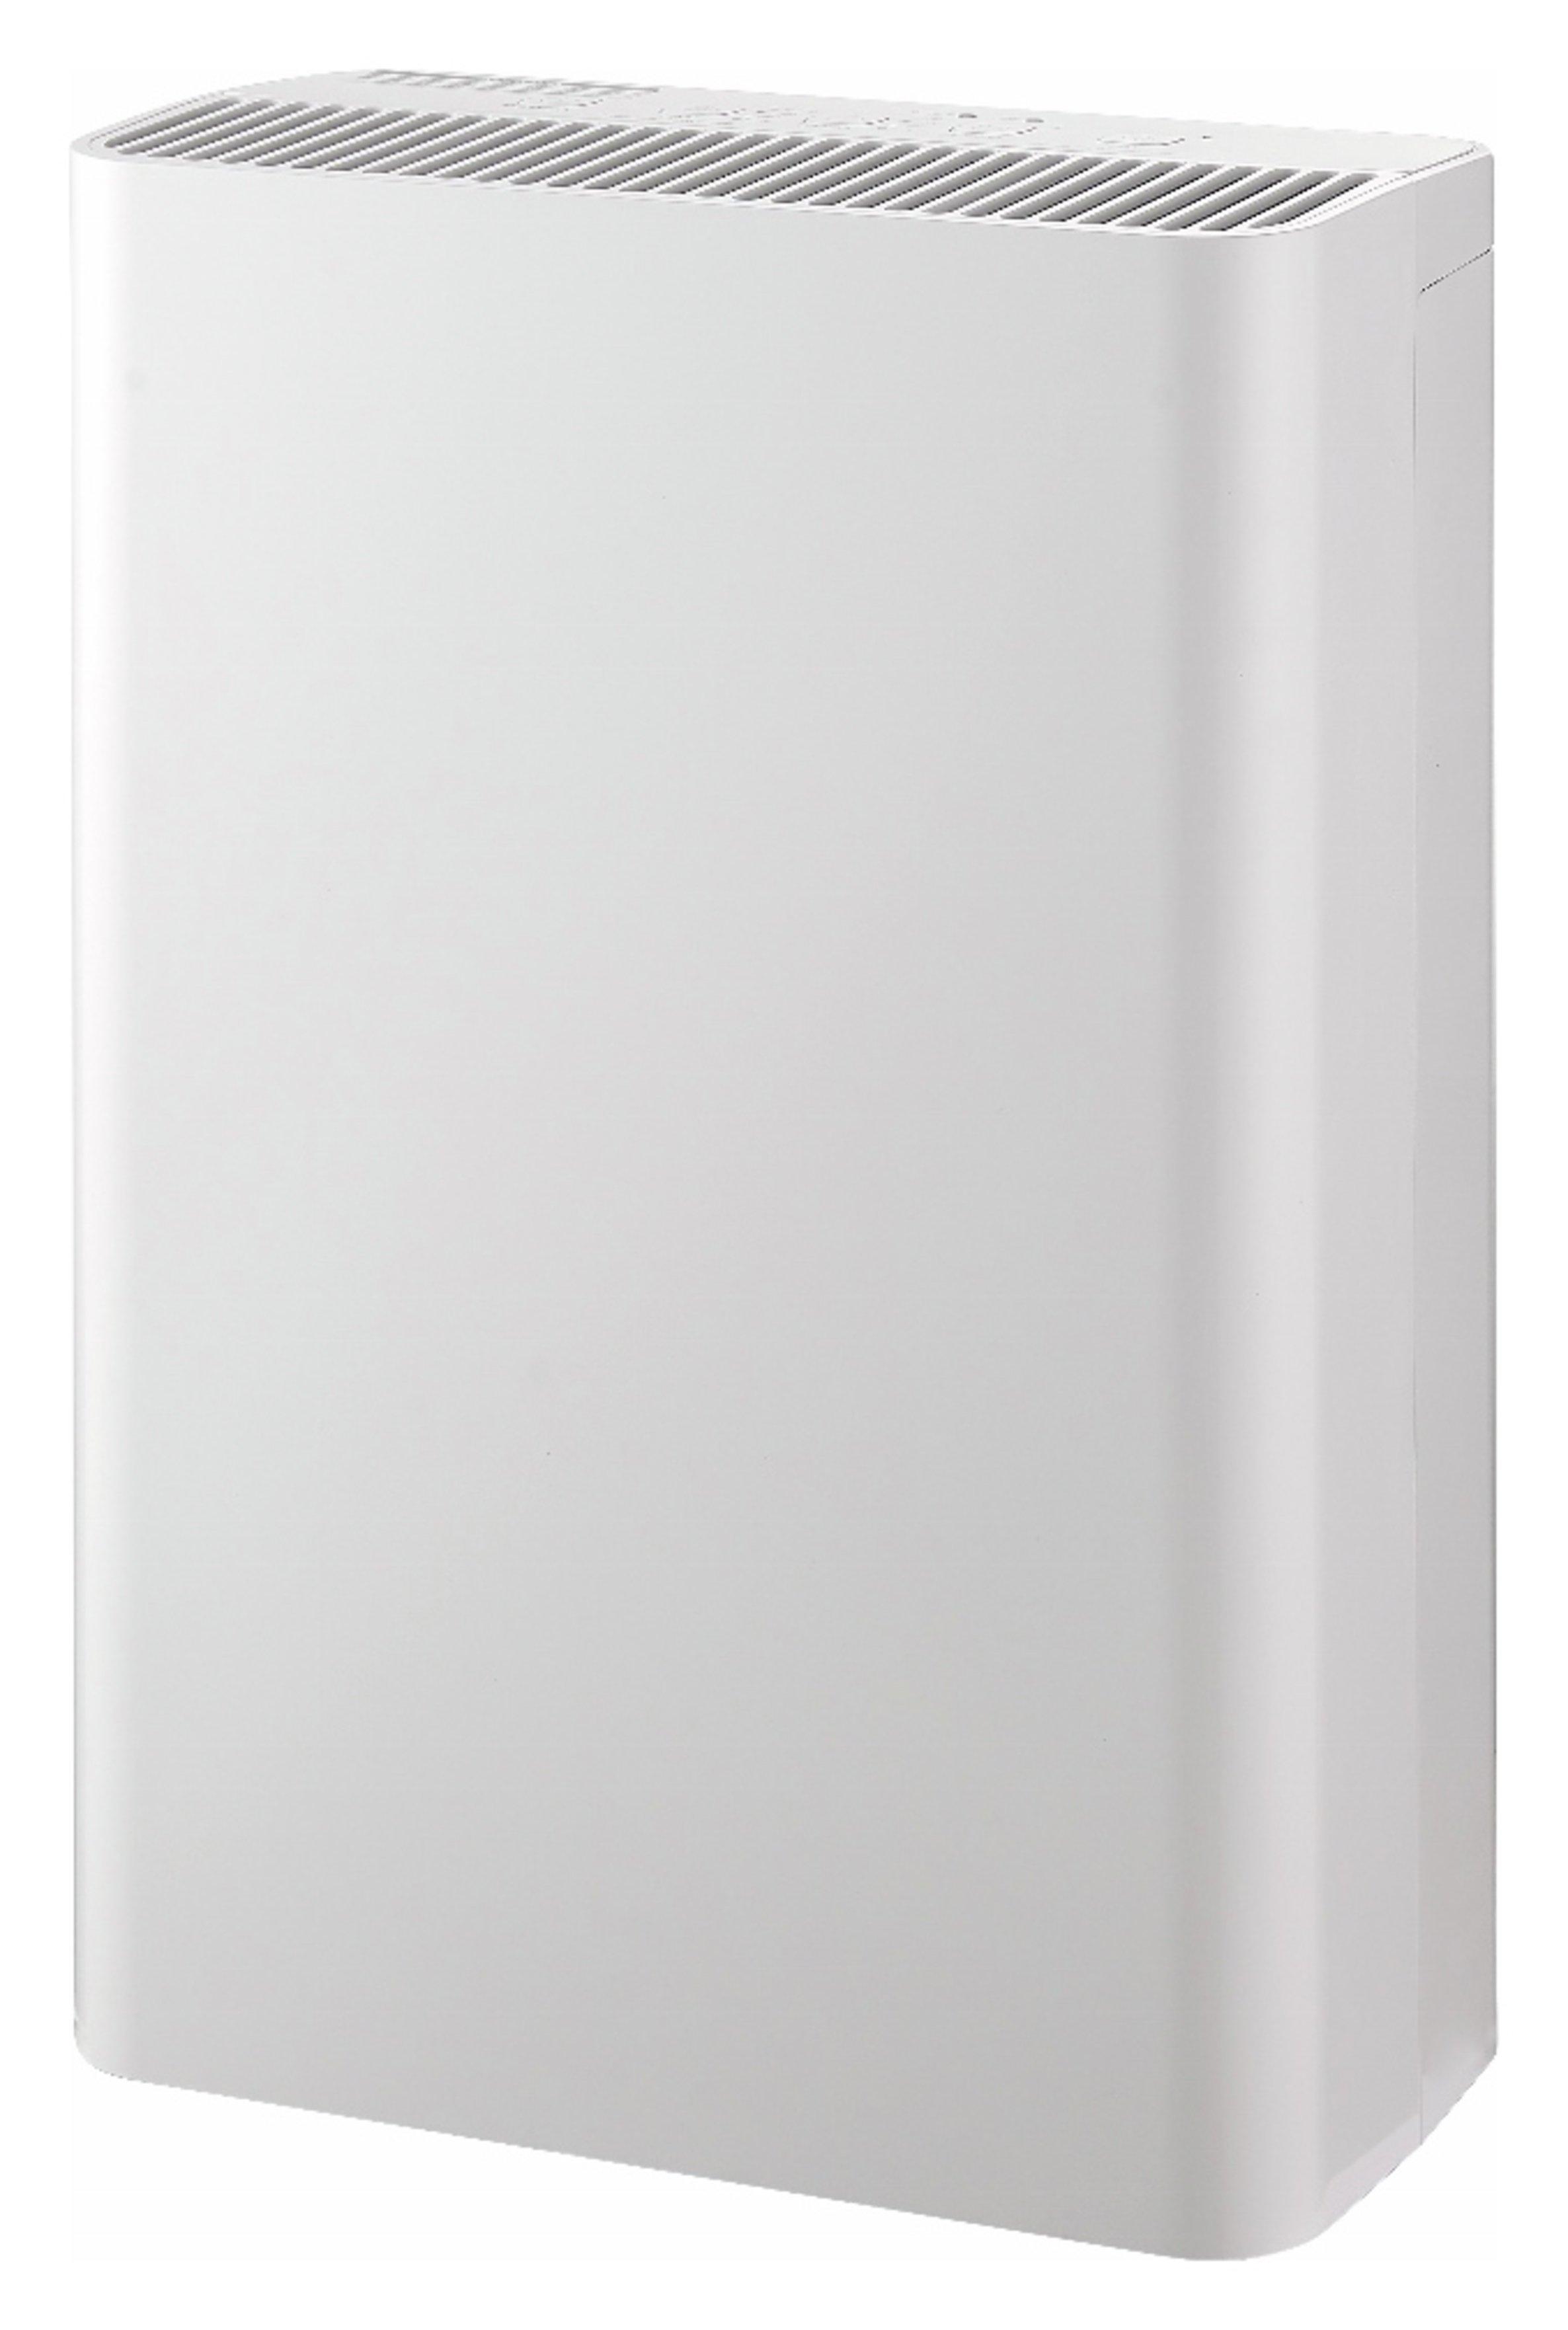 Challenge Air Purifier